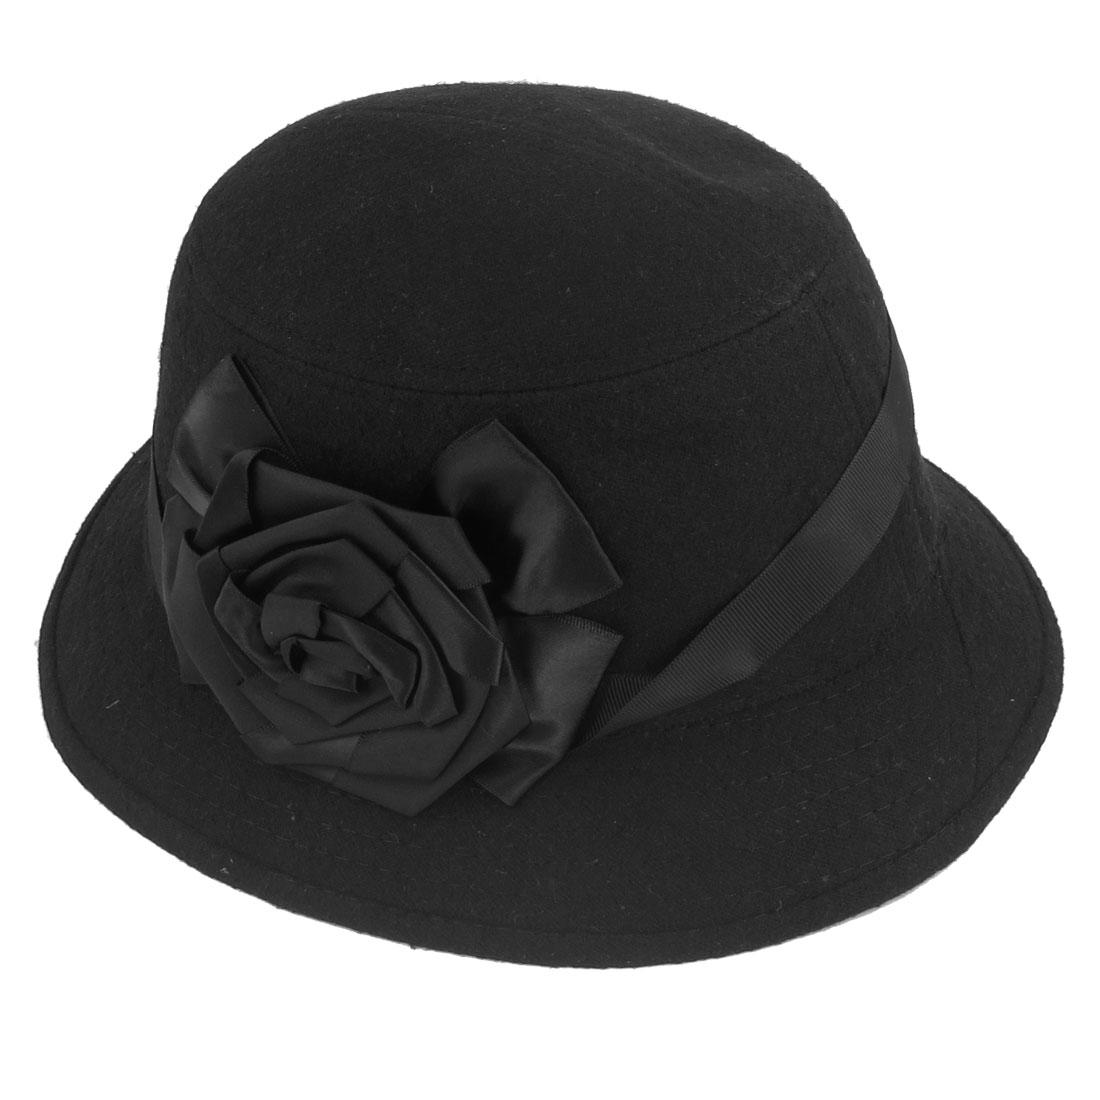 Flower Decor Black Fleece Cloche Bucket Hat for Ladies